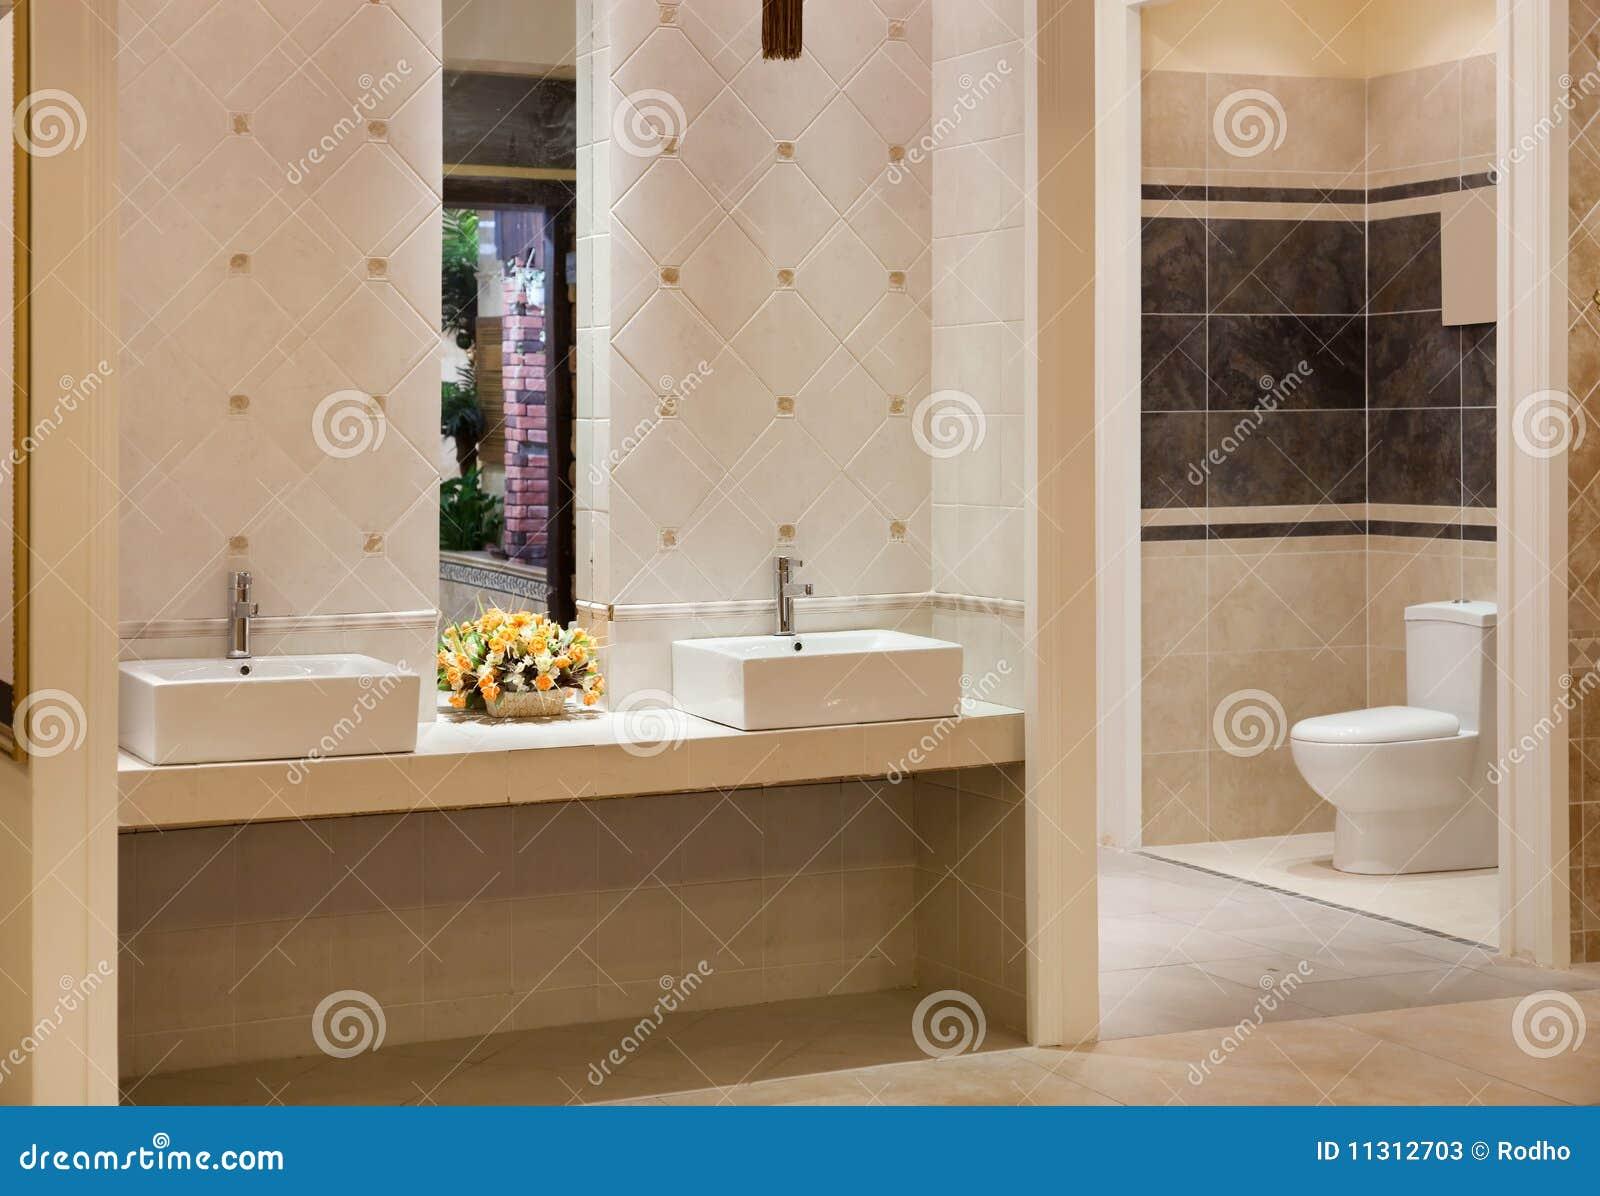 Cuarto De Baño Moderno Fotos:Cuarto De Baño Moderno Lujoso Fotos de archivo – Imagen: 11312703